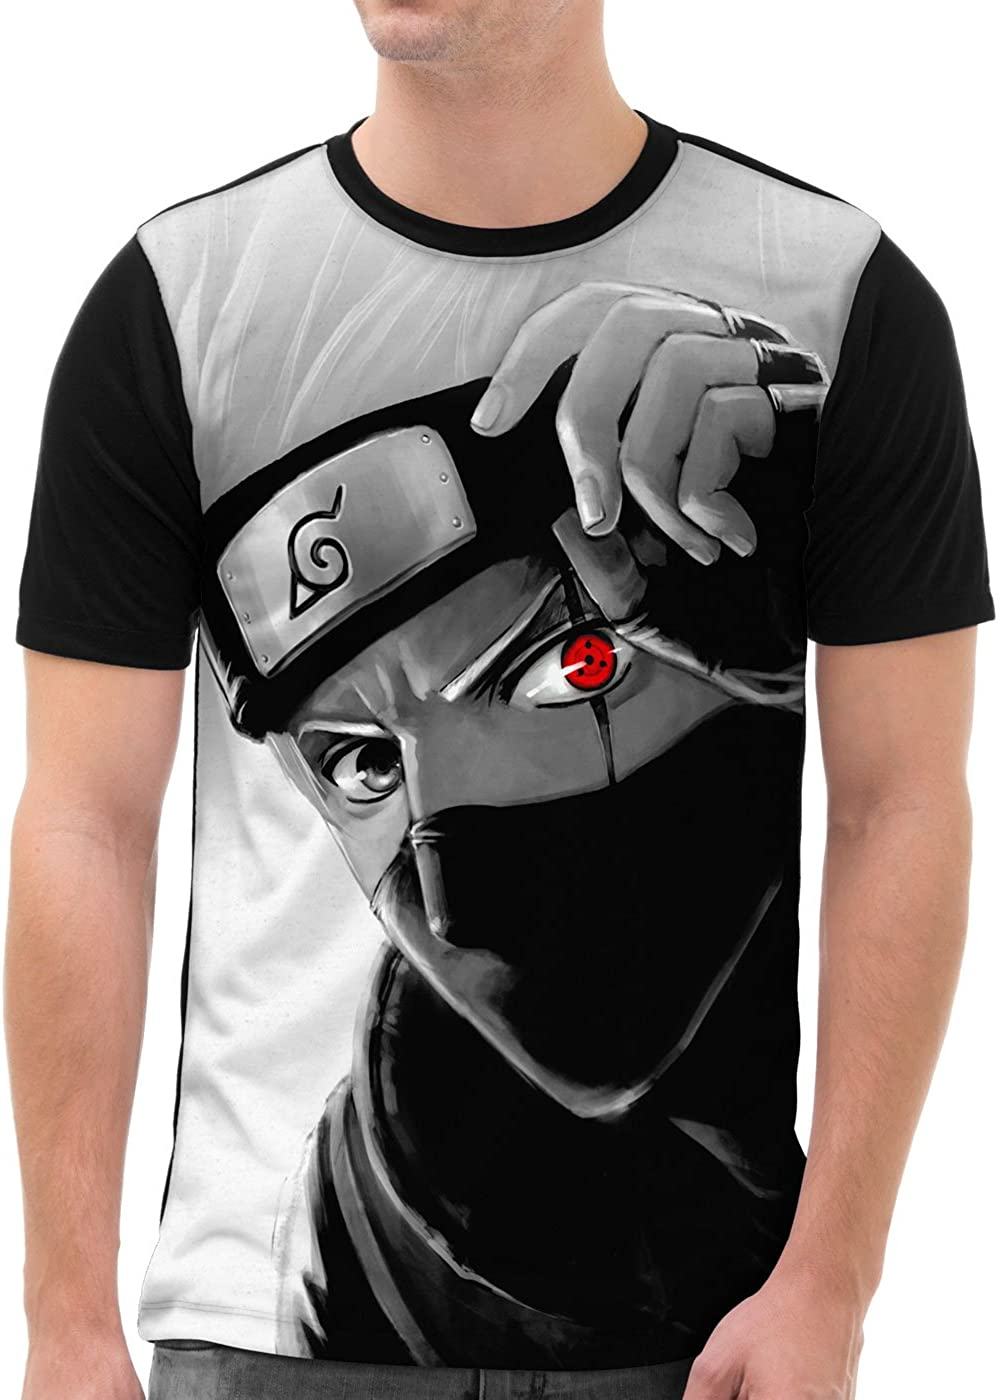 VOID Kakashi Hatake Camiseta gráfica para Hombre T-Shirt All-Over Print Ninja Anime Manga: Amazon.es: Ropa y accesorios